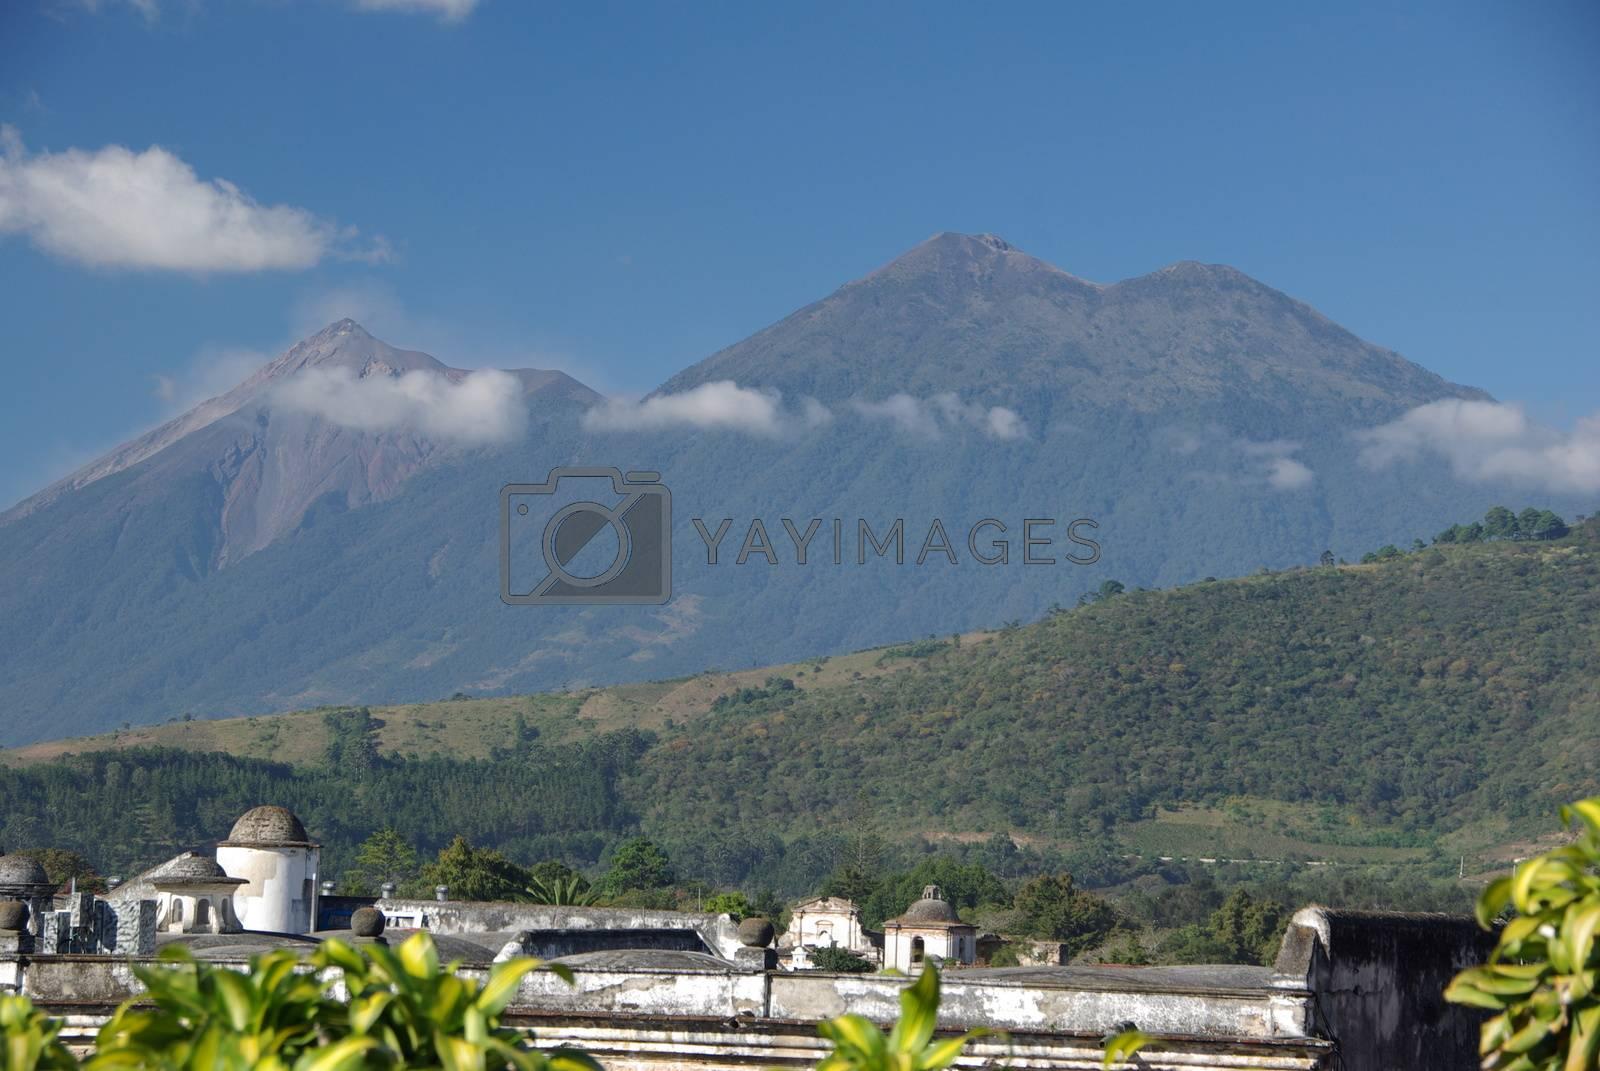 Volcanoes in the city of Antigua in Guatemala, Central America